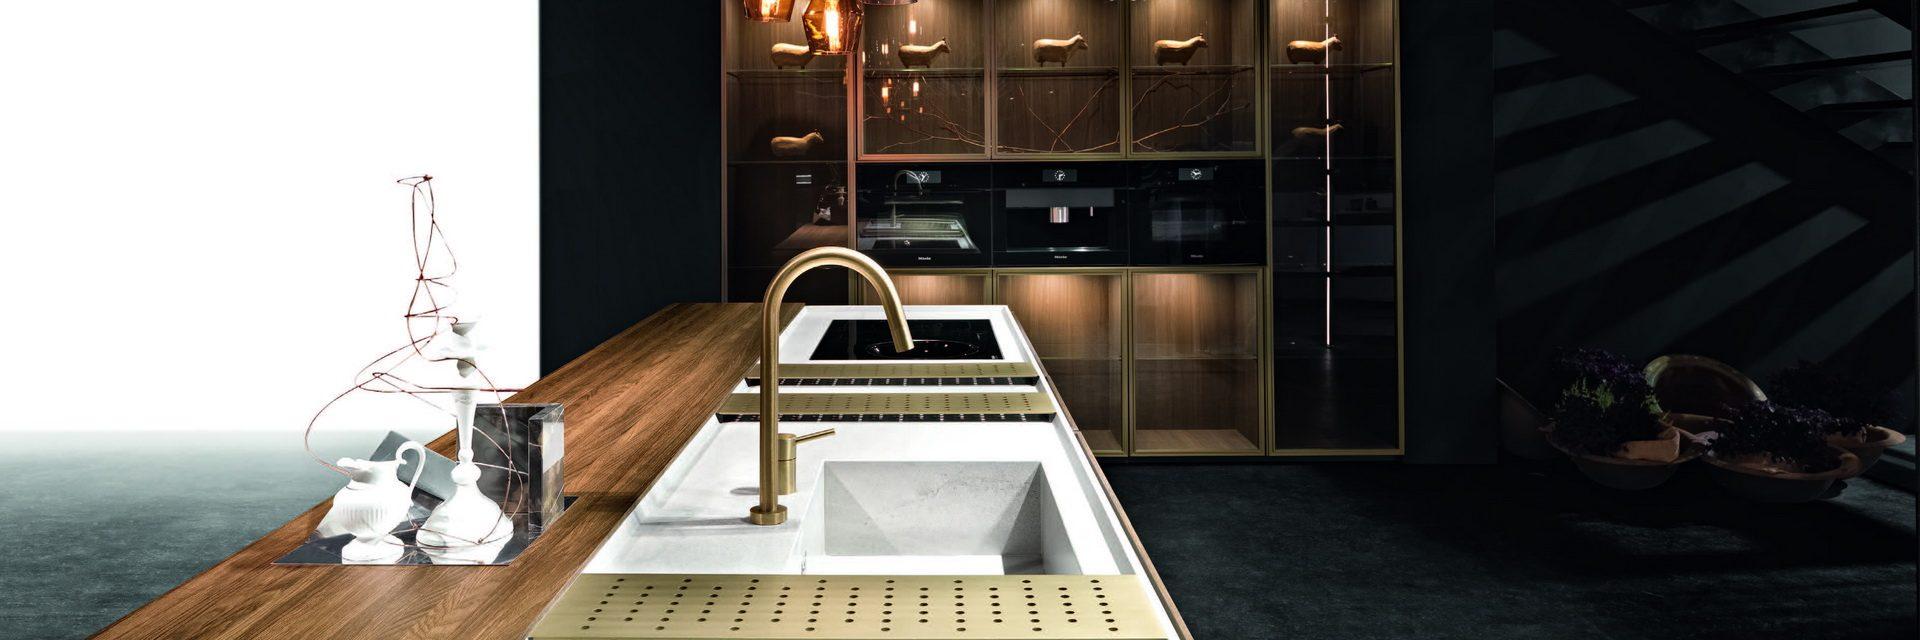 Binova milano   via durini   cucine moderne di design made in italy